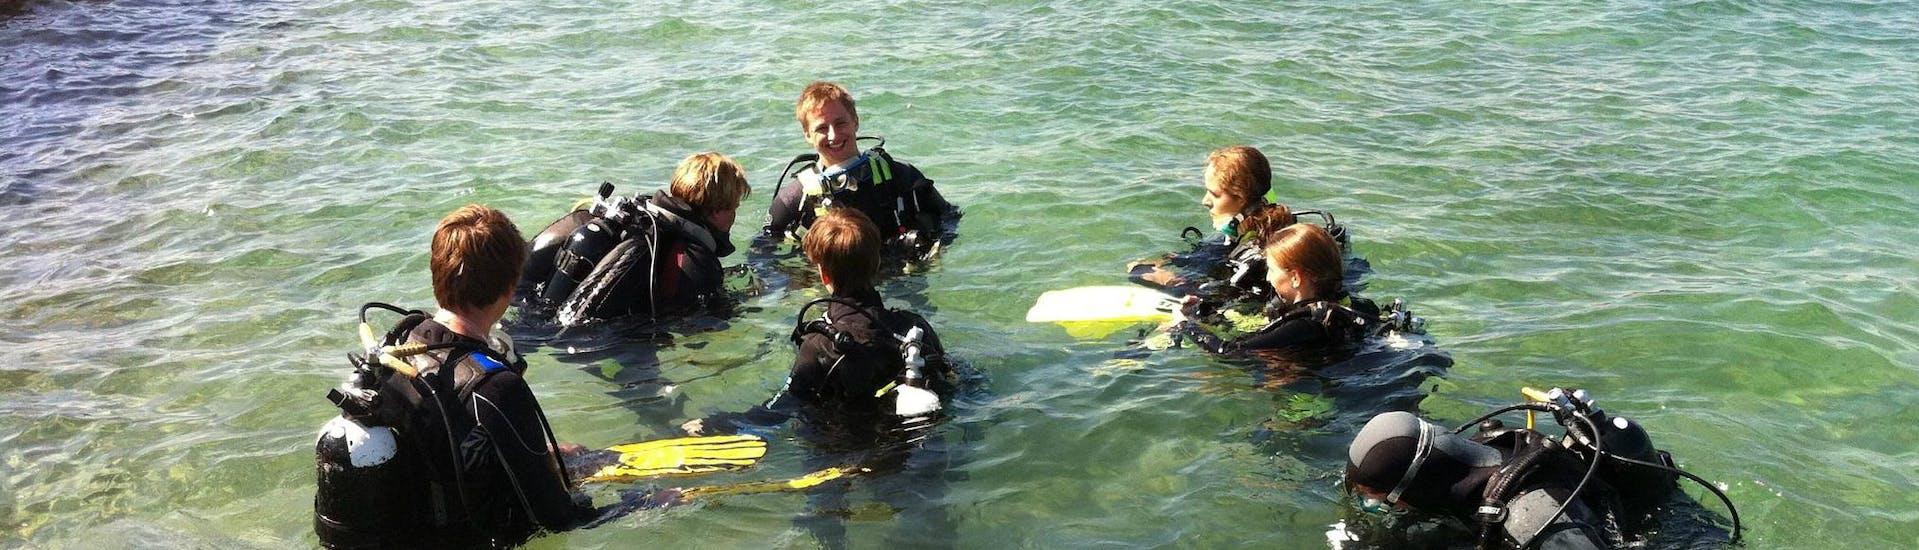 IAC Open Water Diver Course in Malinska for Beginners